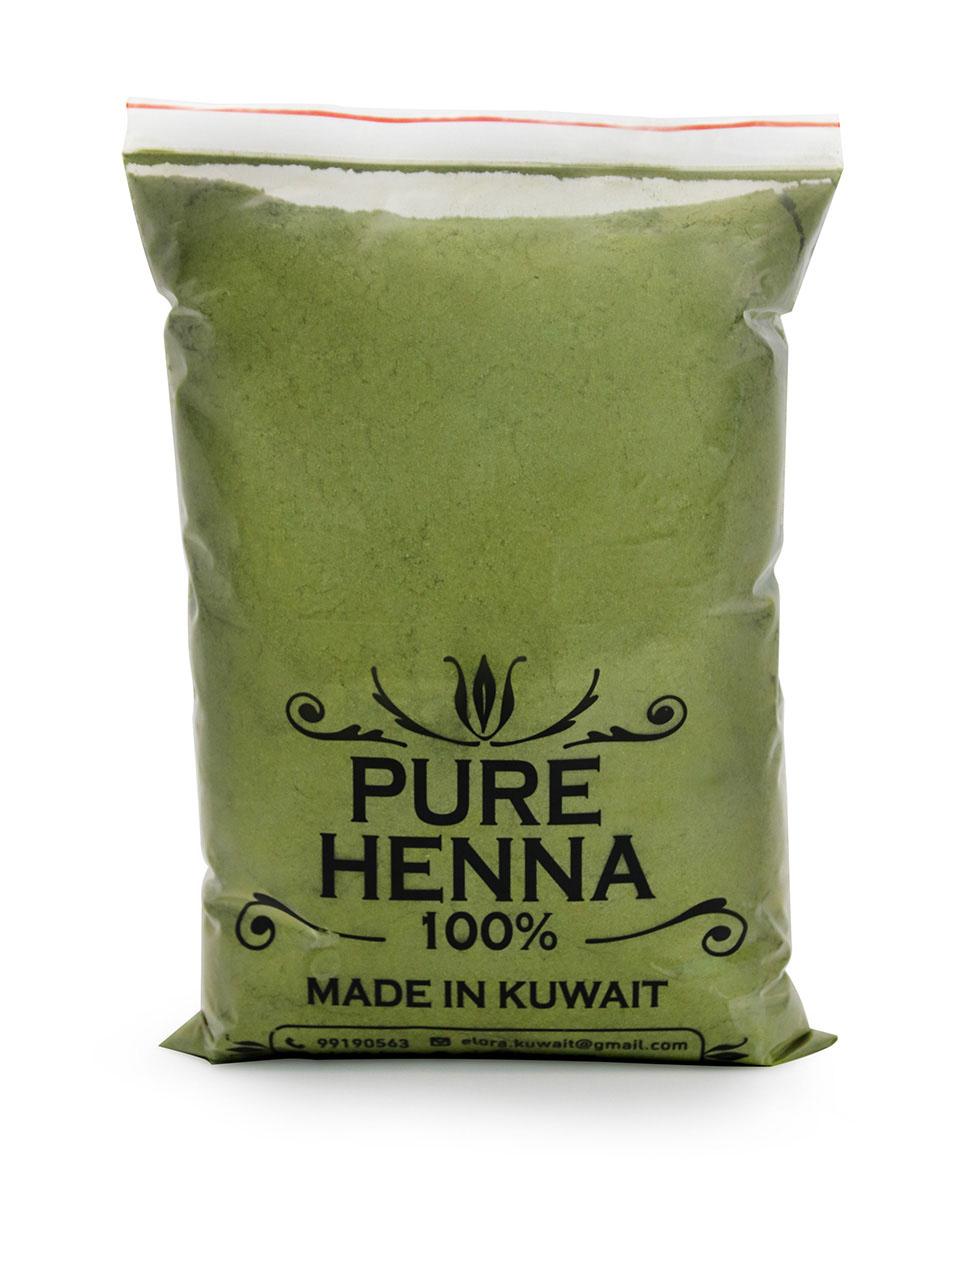 PURE HENNA 100%